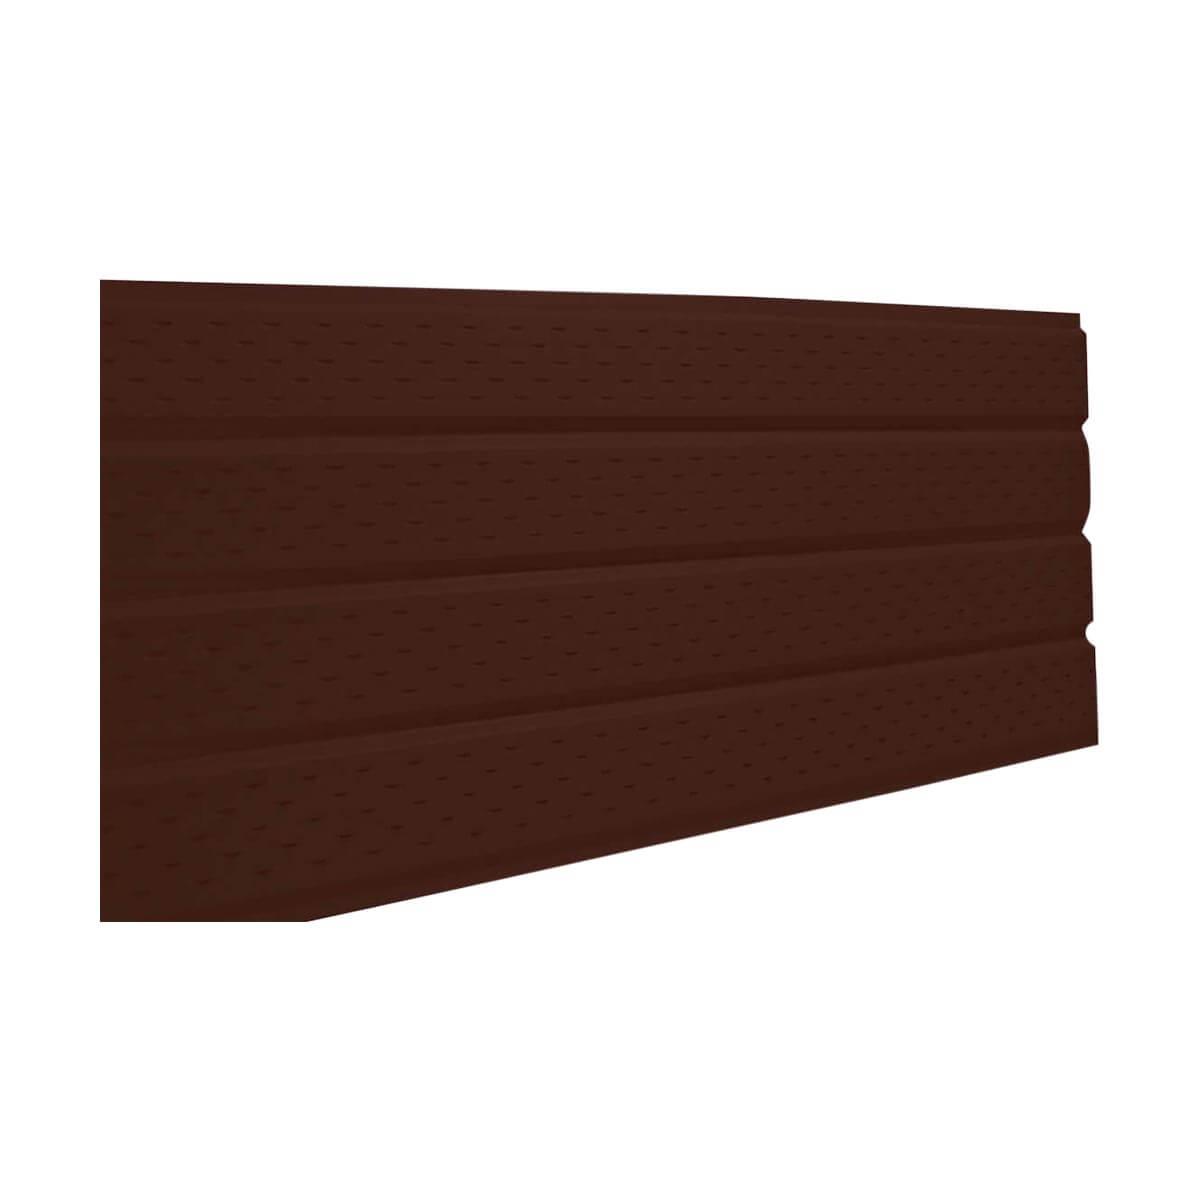 4 Panel Aluminum Soffit - Vented - Brown